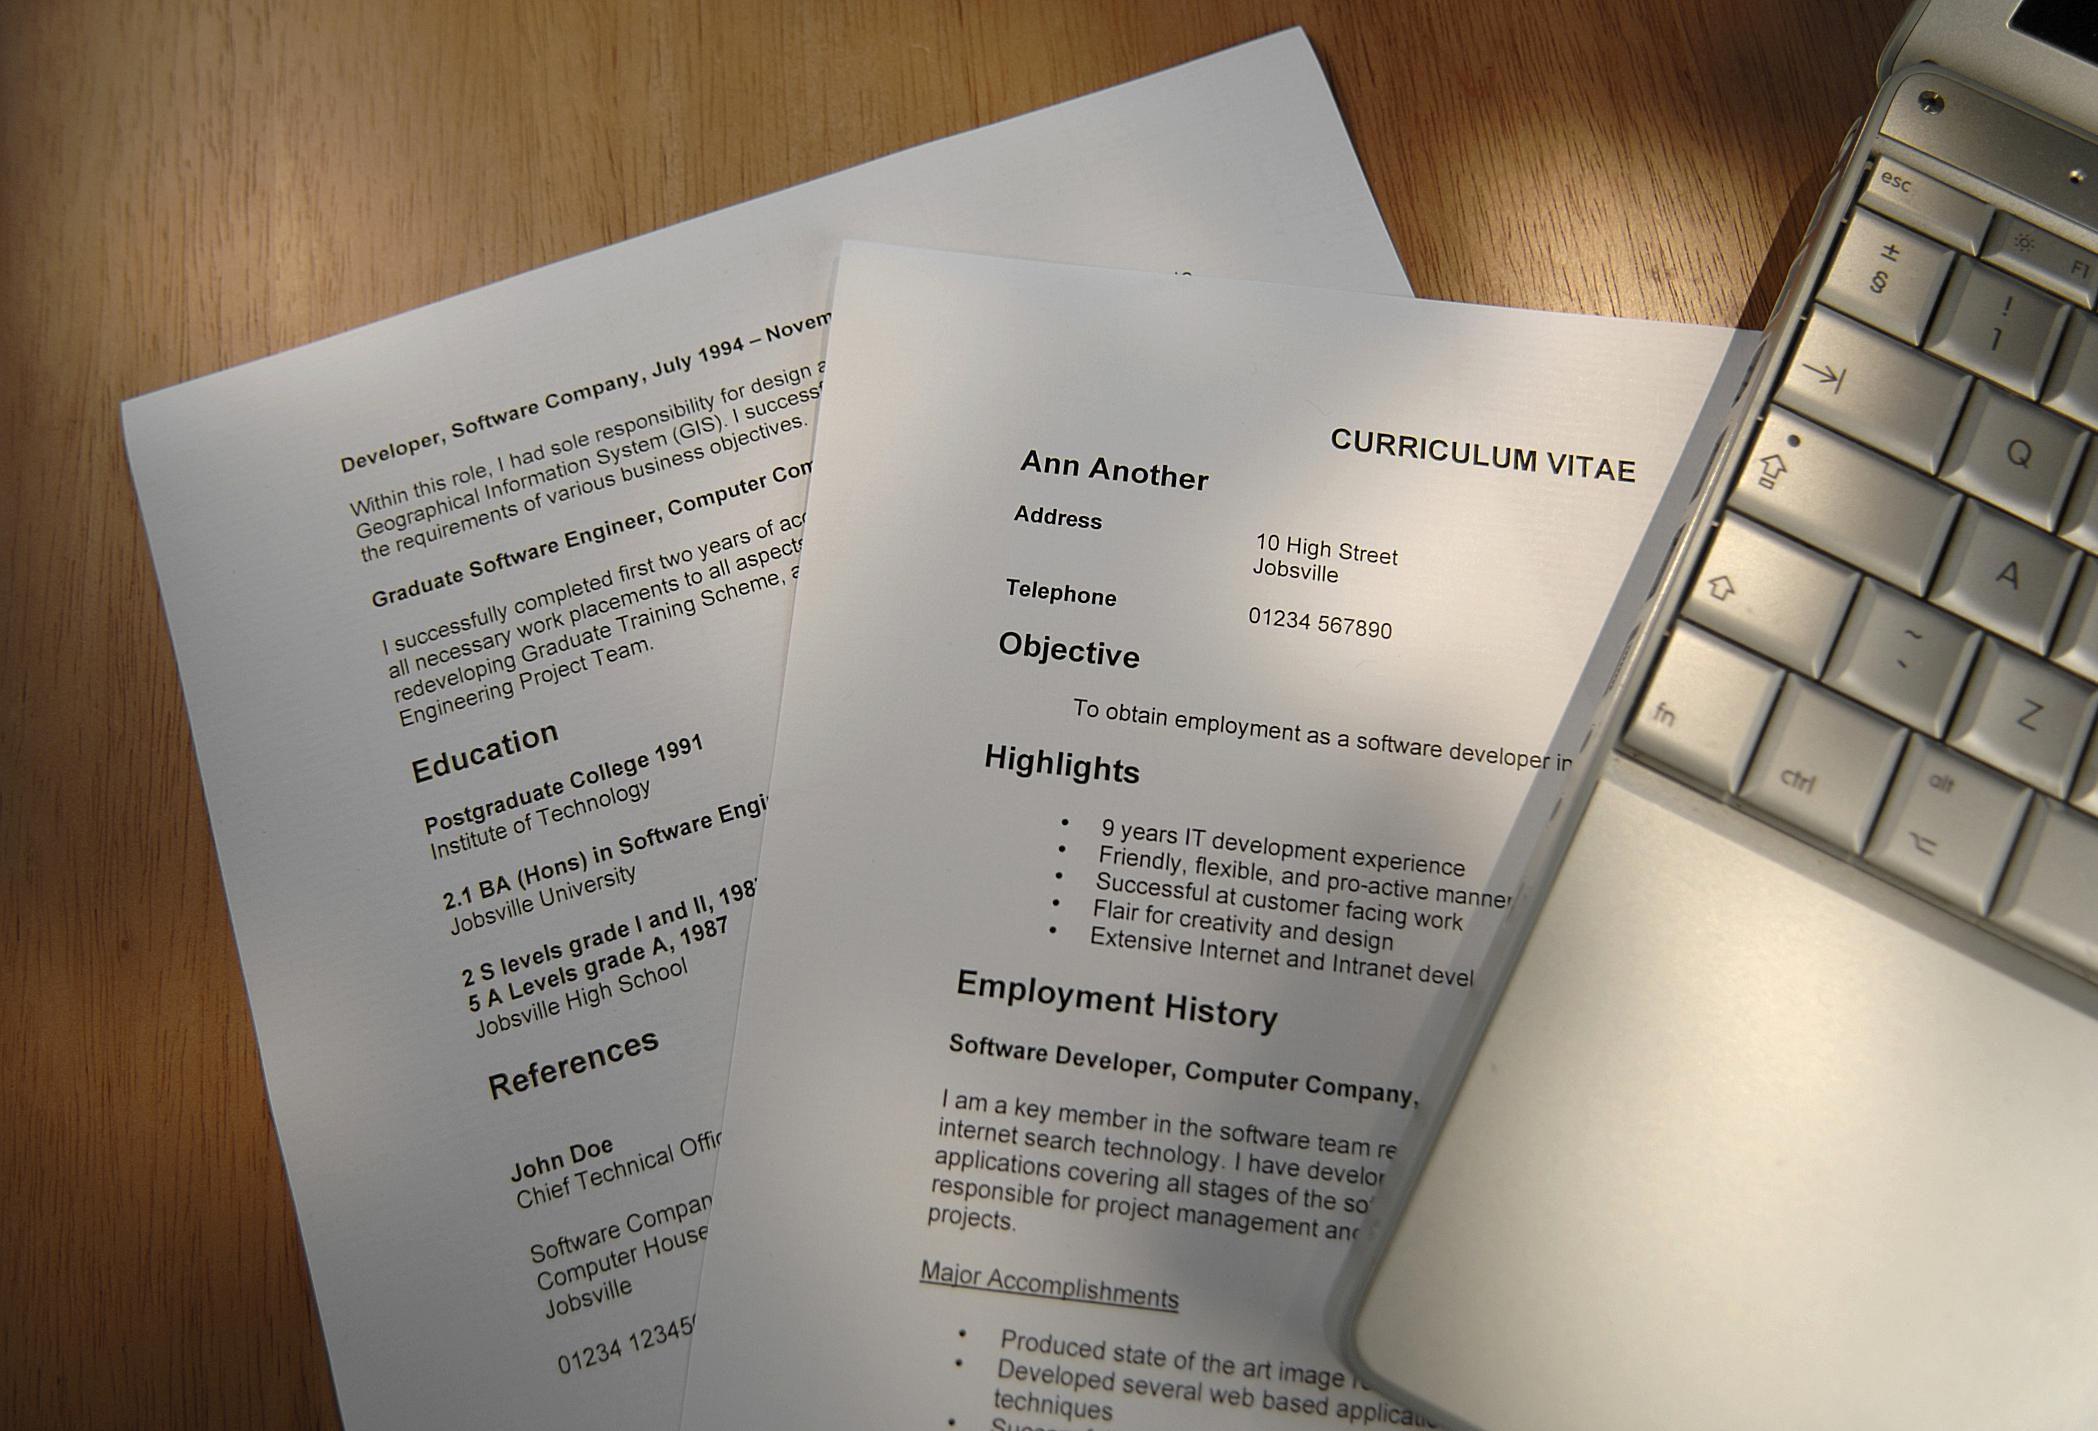 Academic CV Samples and Writing Tips